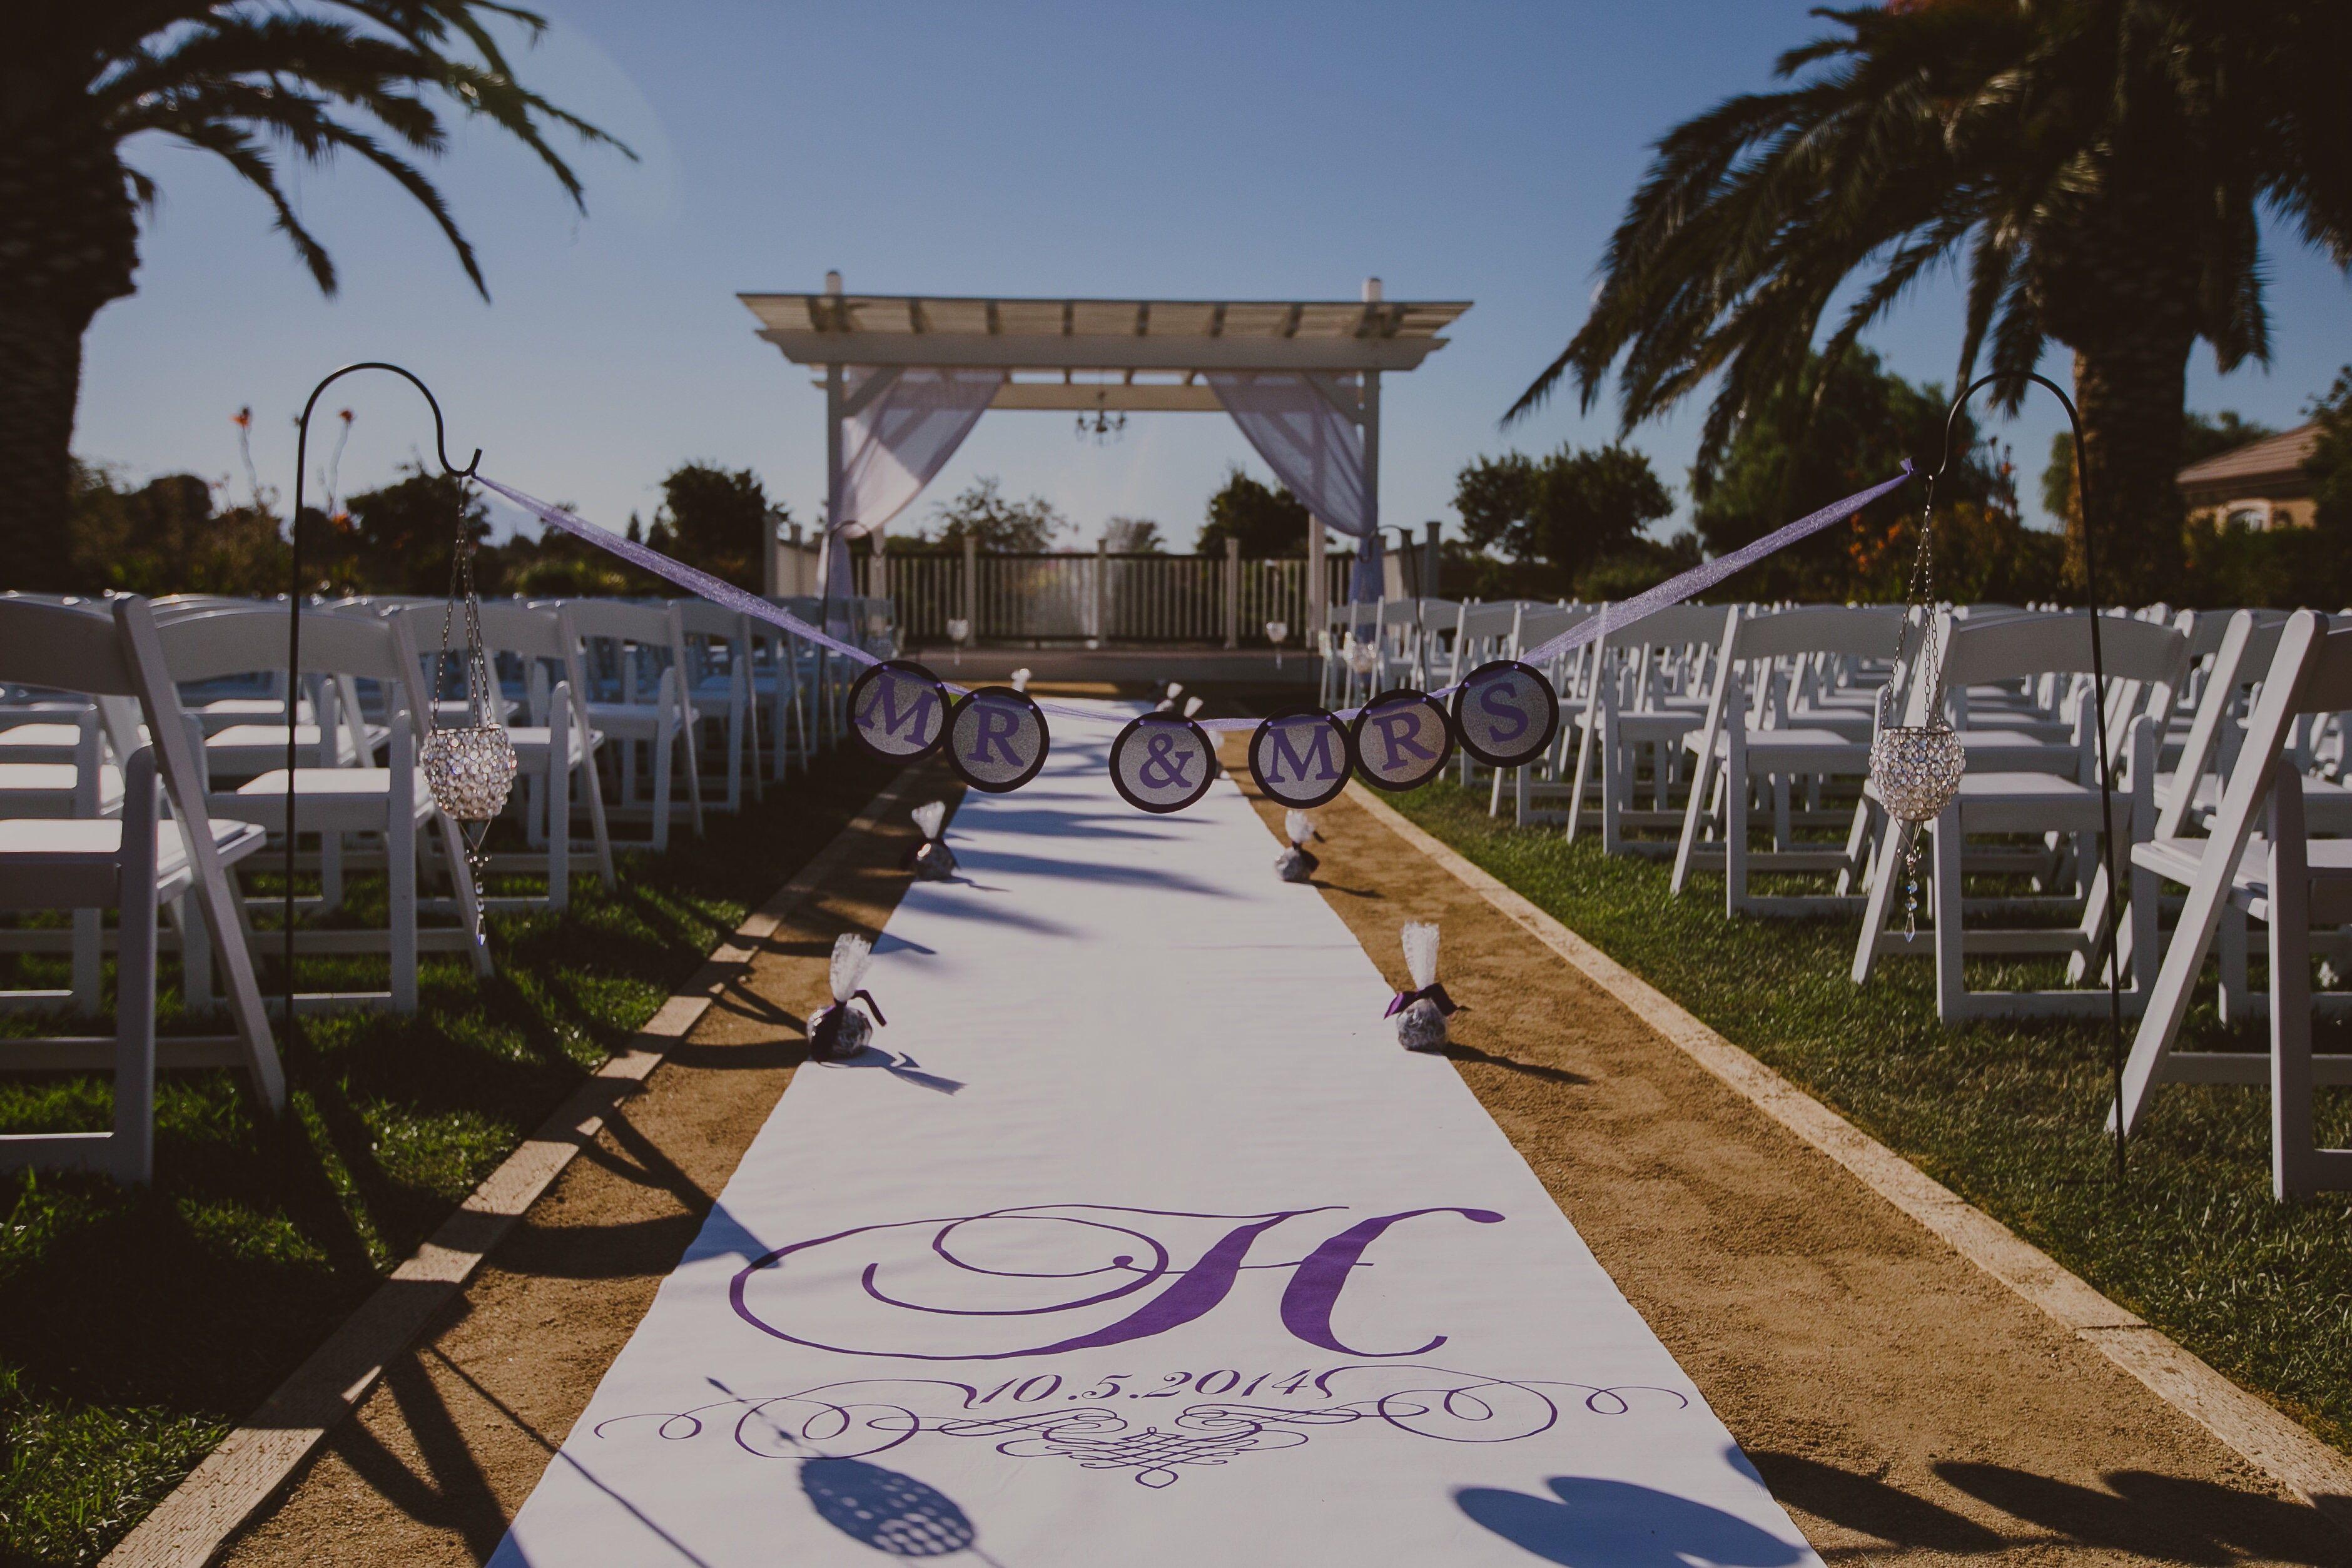 wedding runners 50ft wedding runner by I Do Aisle Runners Tampa Fl October wedding